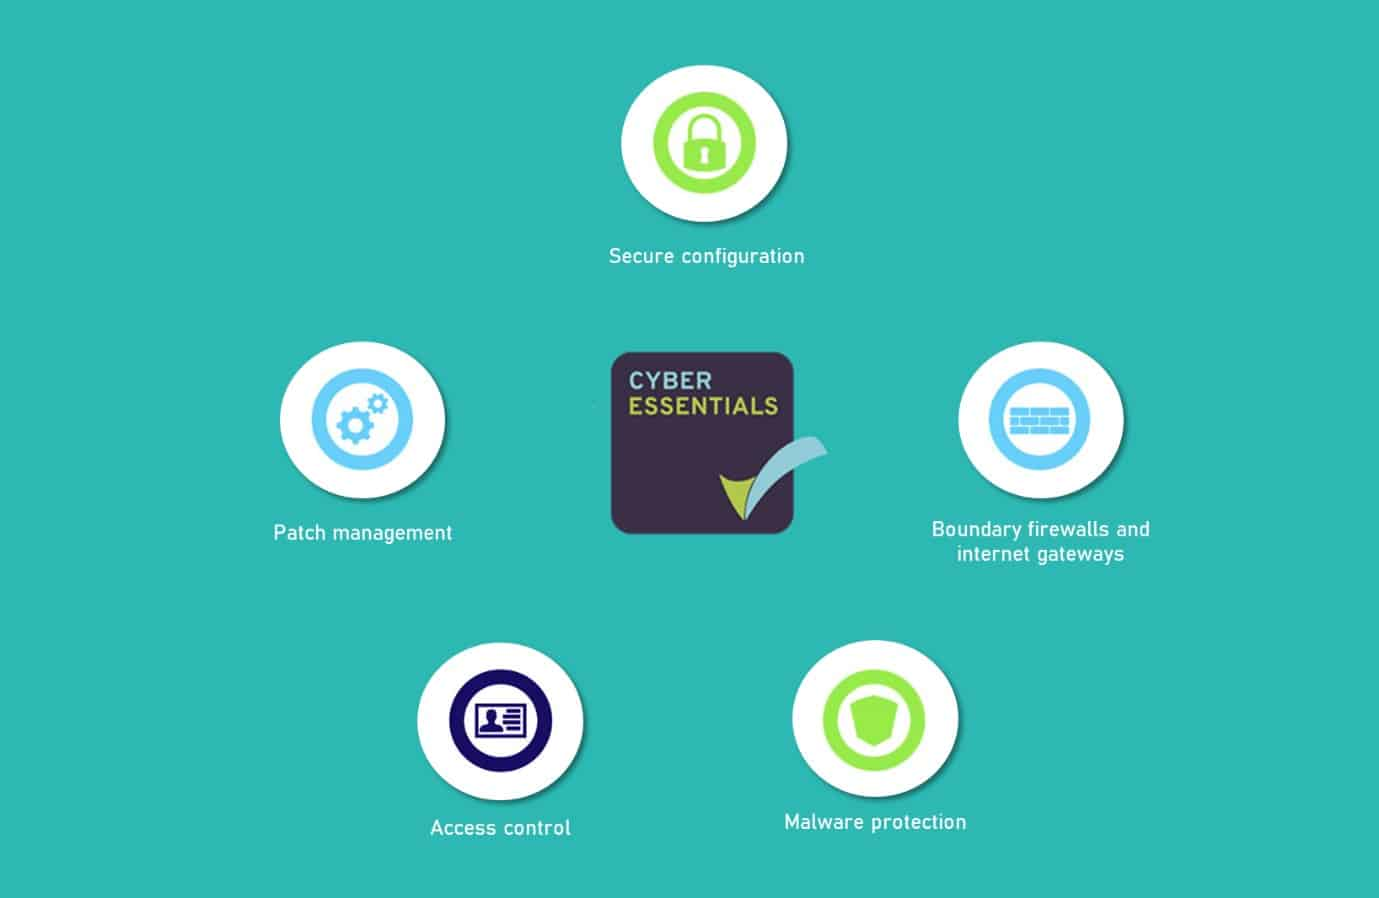 Cyber Essentials requirements & controls